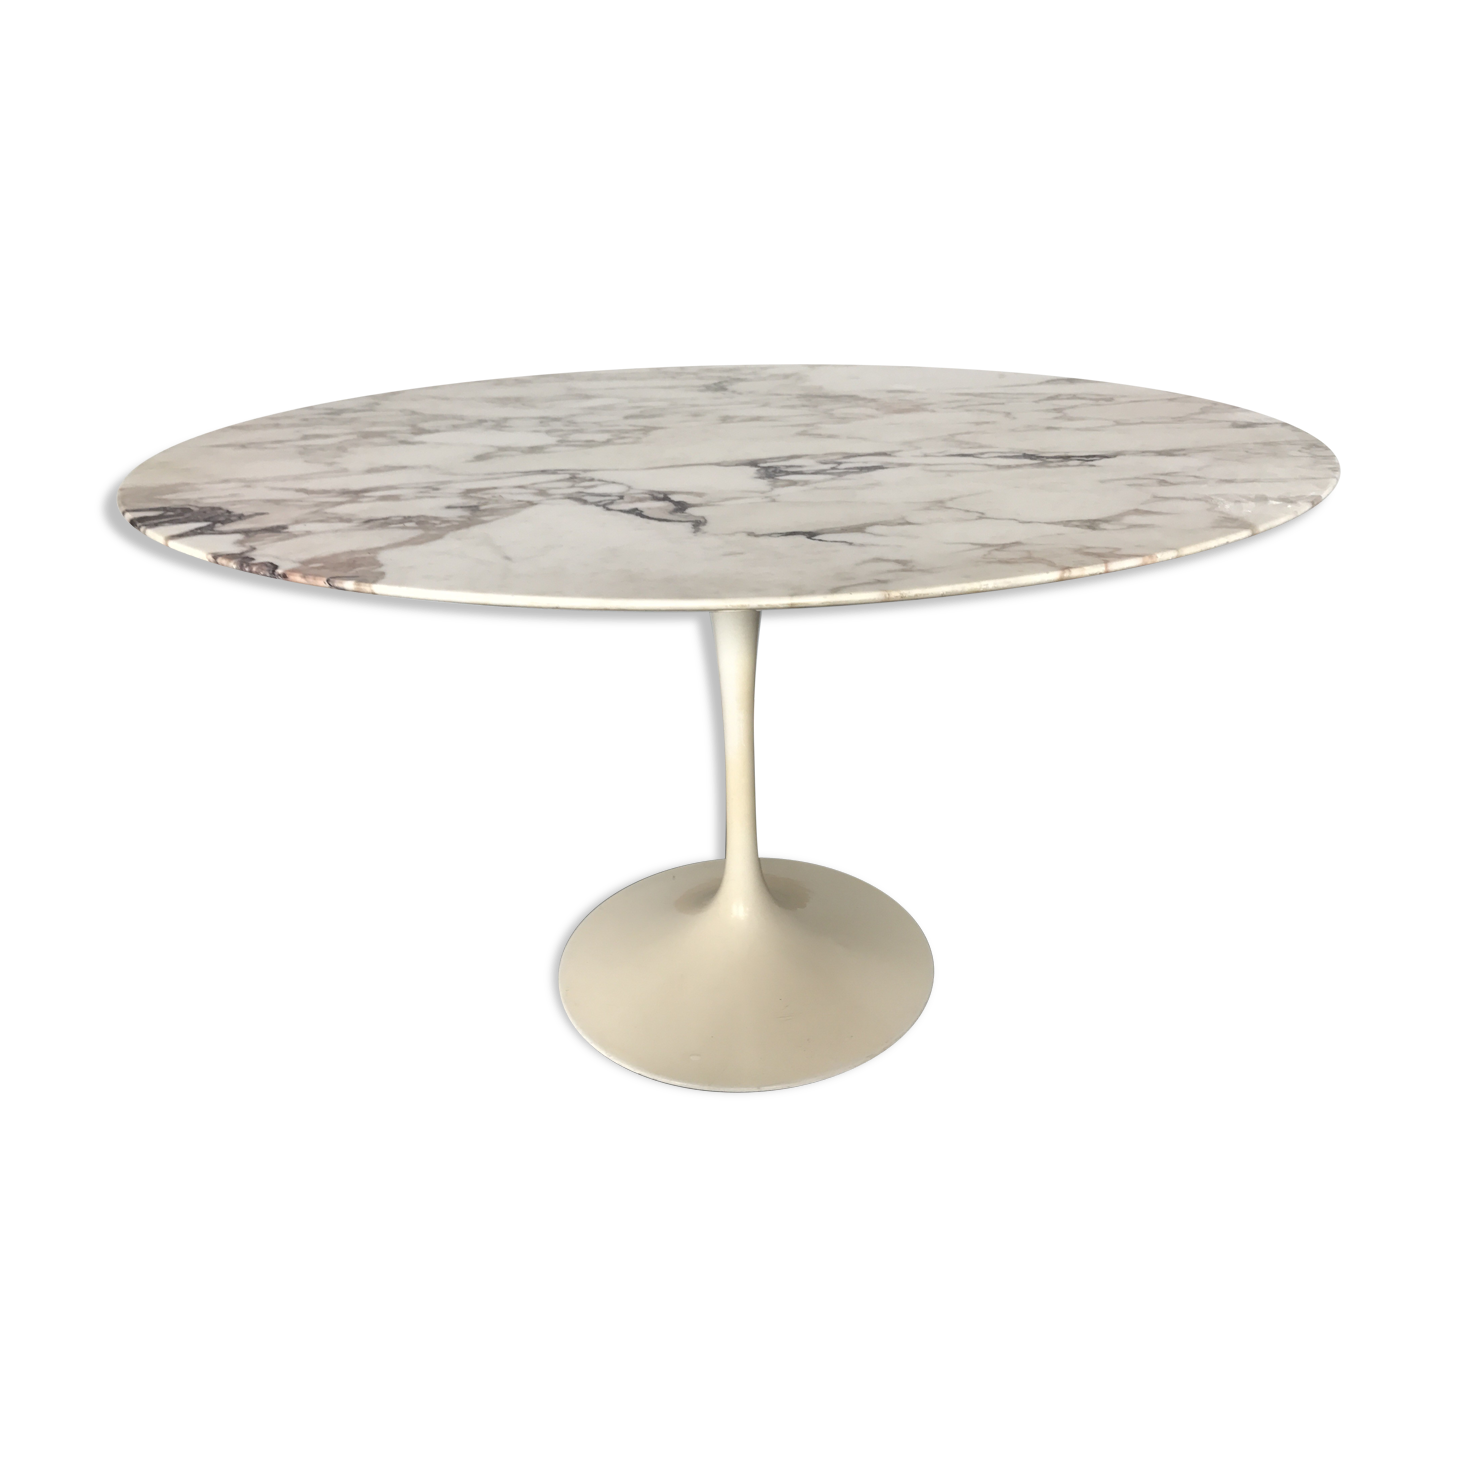 Table ovale marbre design stunning table knoll ronde for Eero saarinen table tulipe ovale en marbre